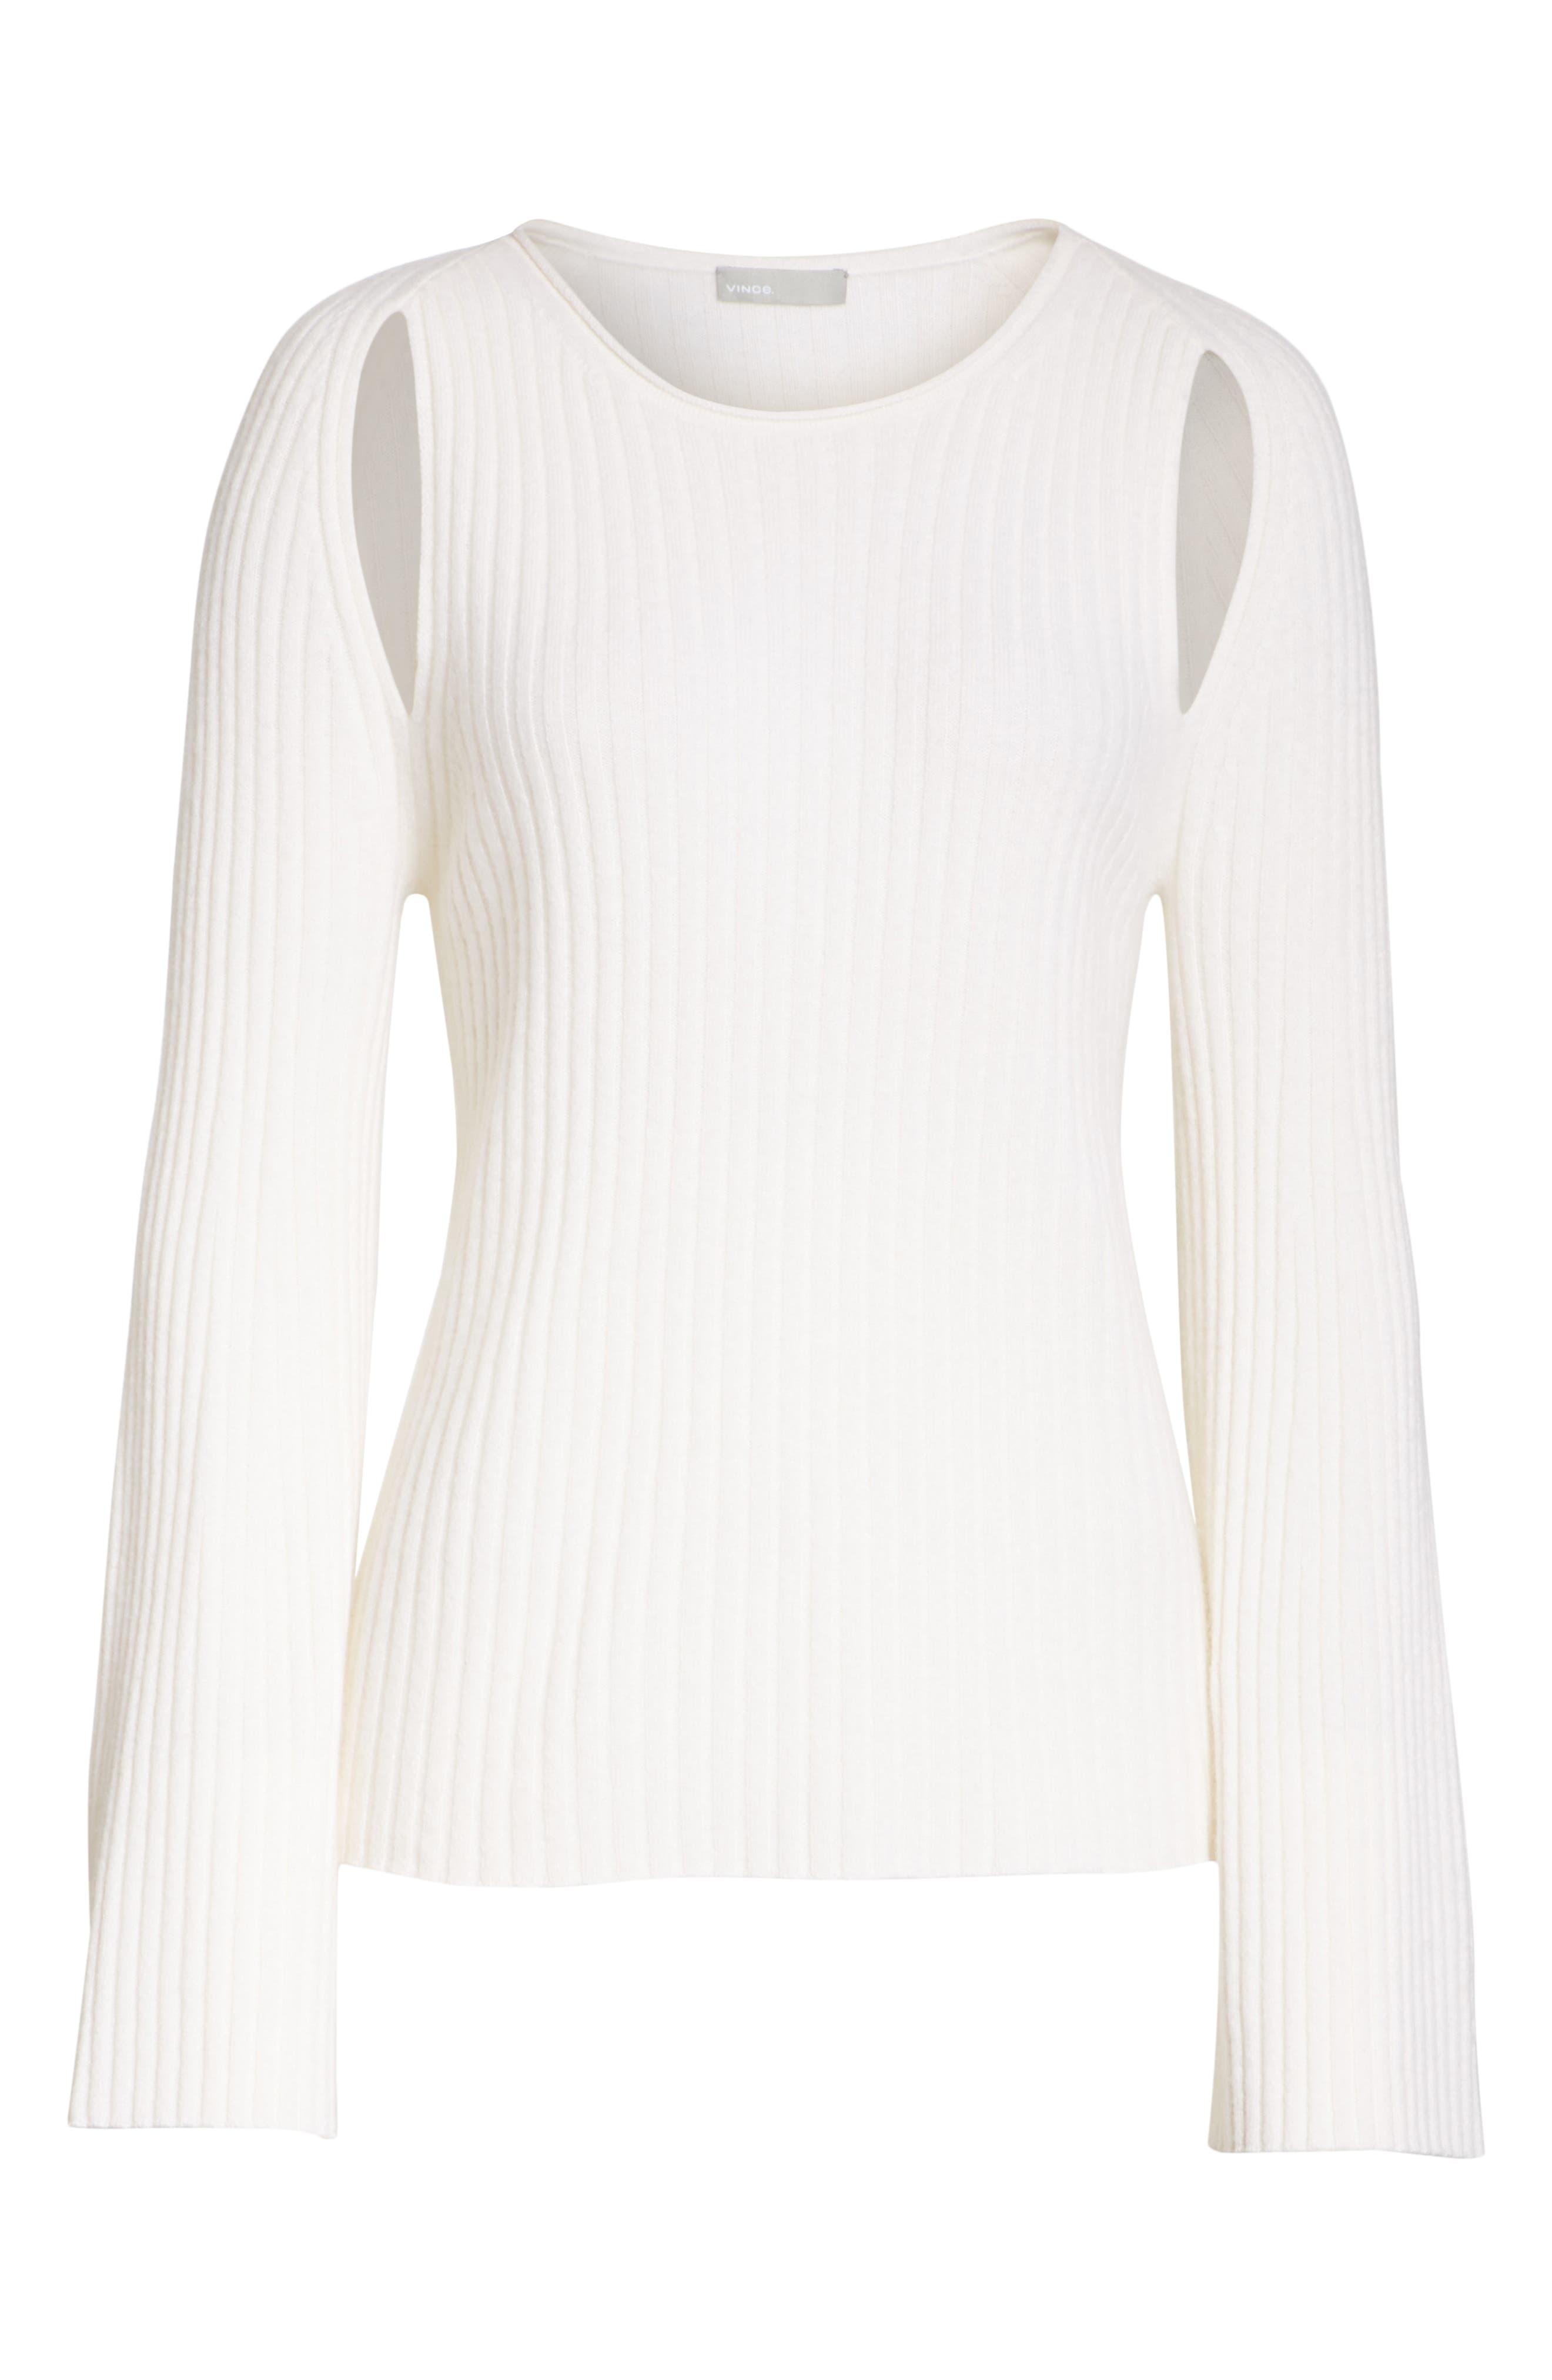 Shoulder Slit Cashmere Crewneck Sweater,                             Alternate thumbnail 6, color,                             Off White